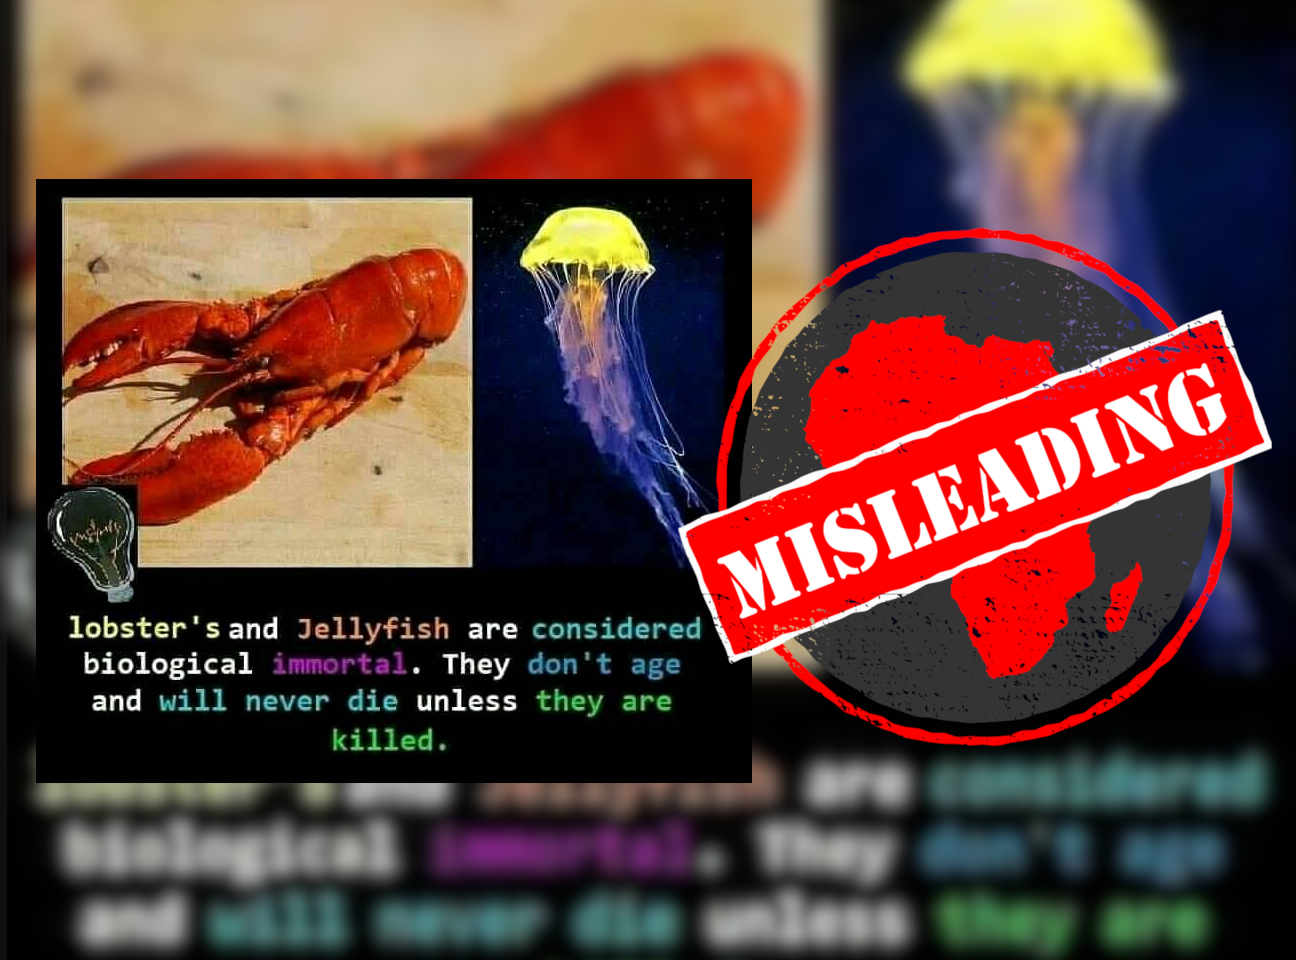 Lobsterjellyfish_Misleading